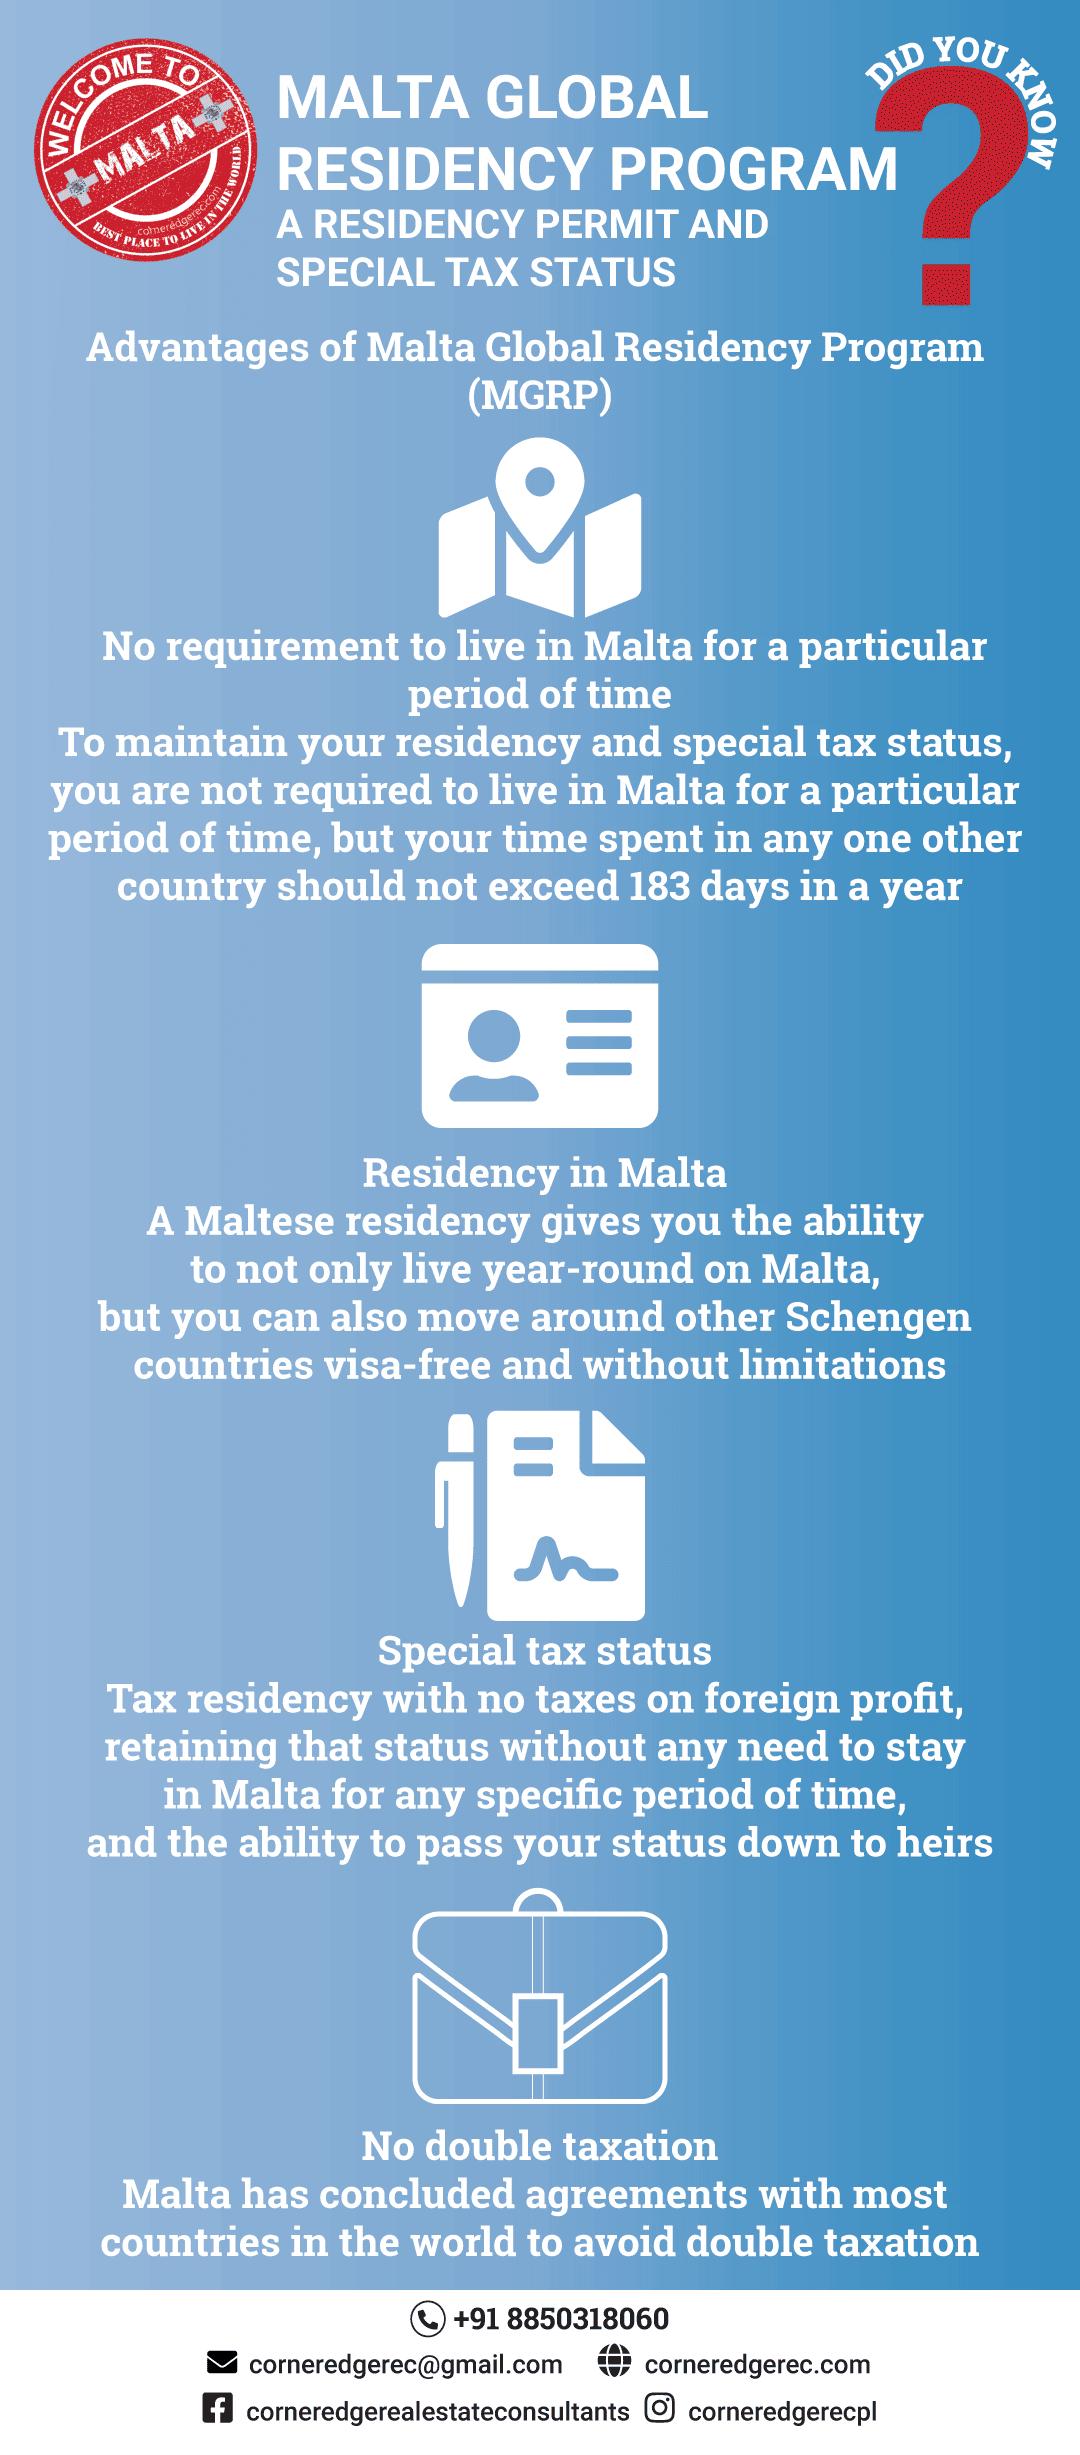 Malta Global Residency Program - Advantages